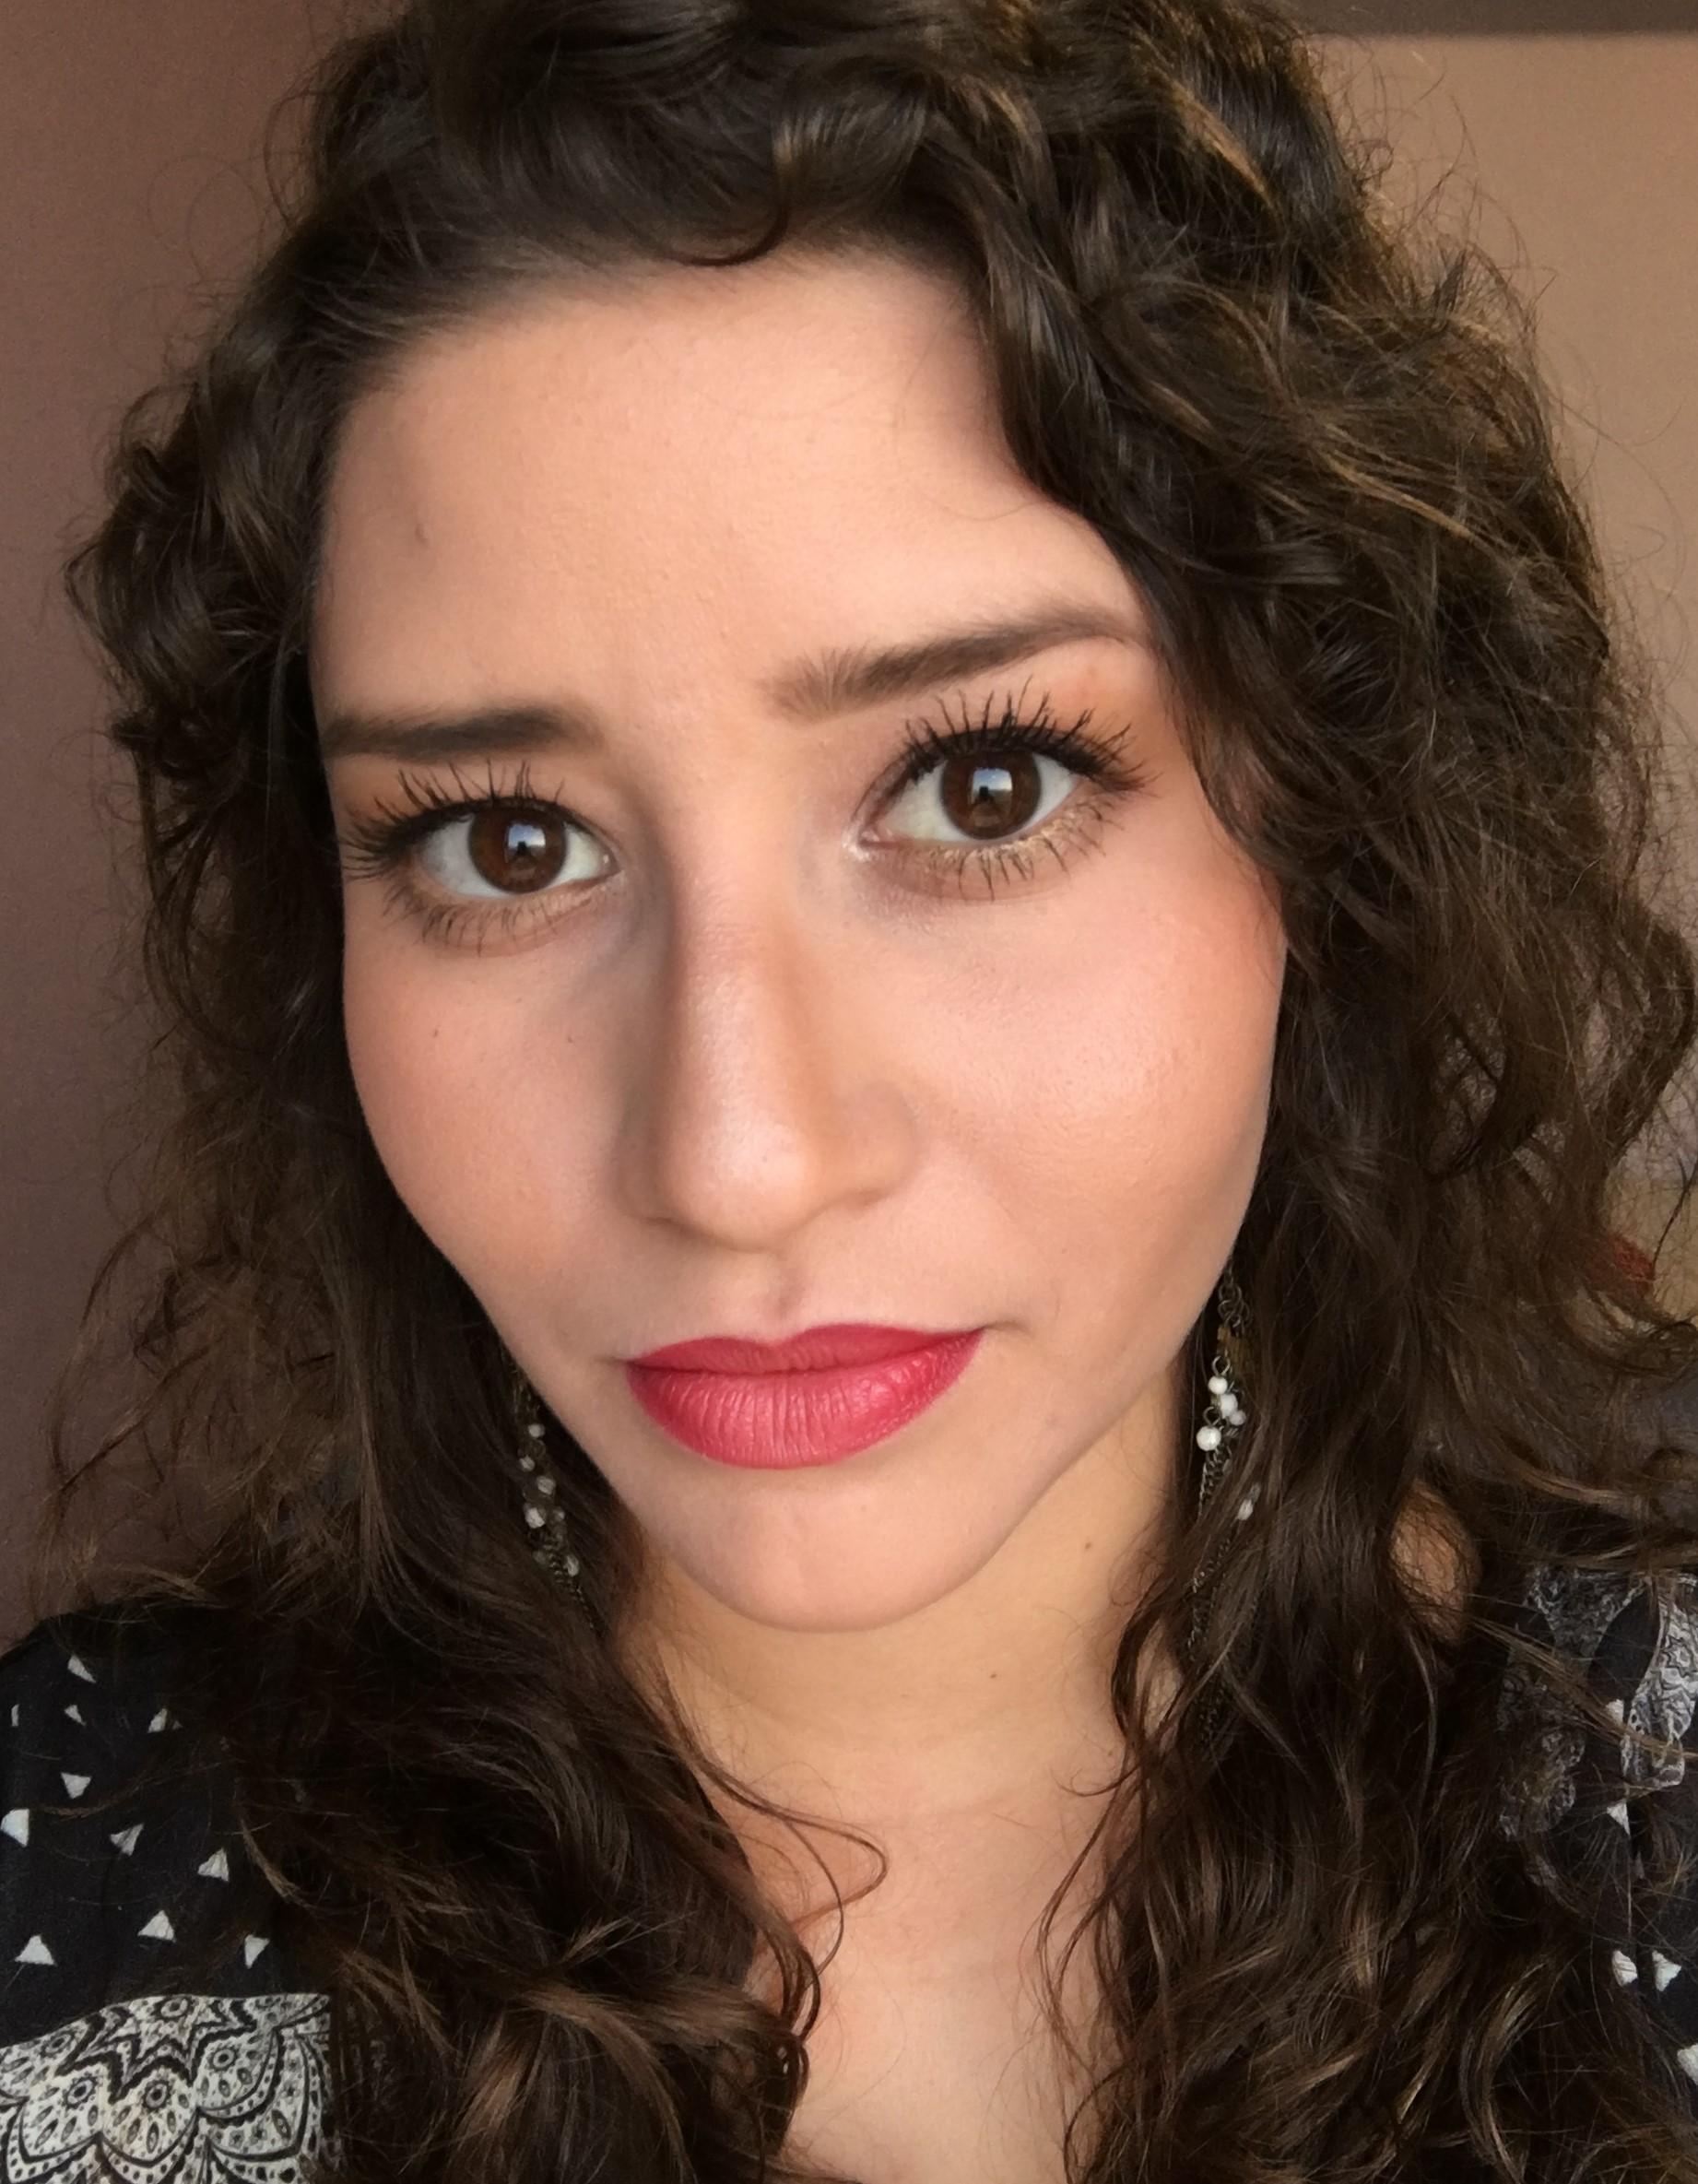 Perfil de LAURA IVETTE VELEZ MARQUEZ